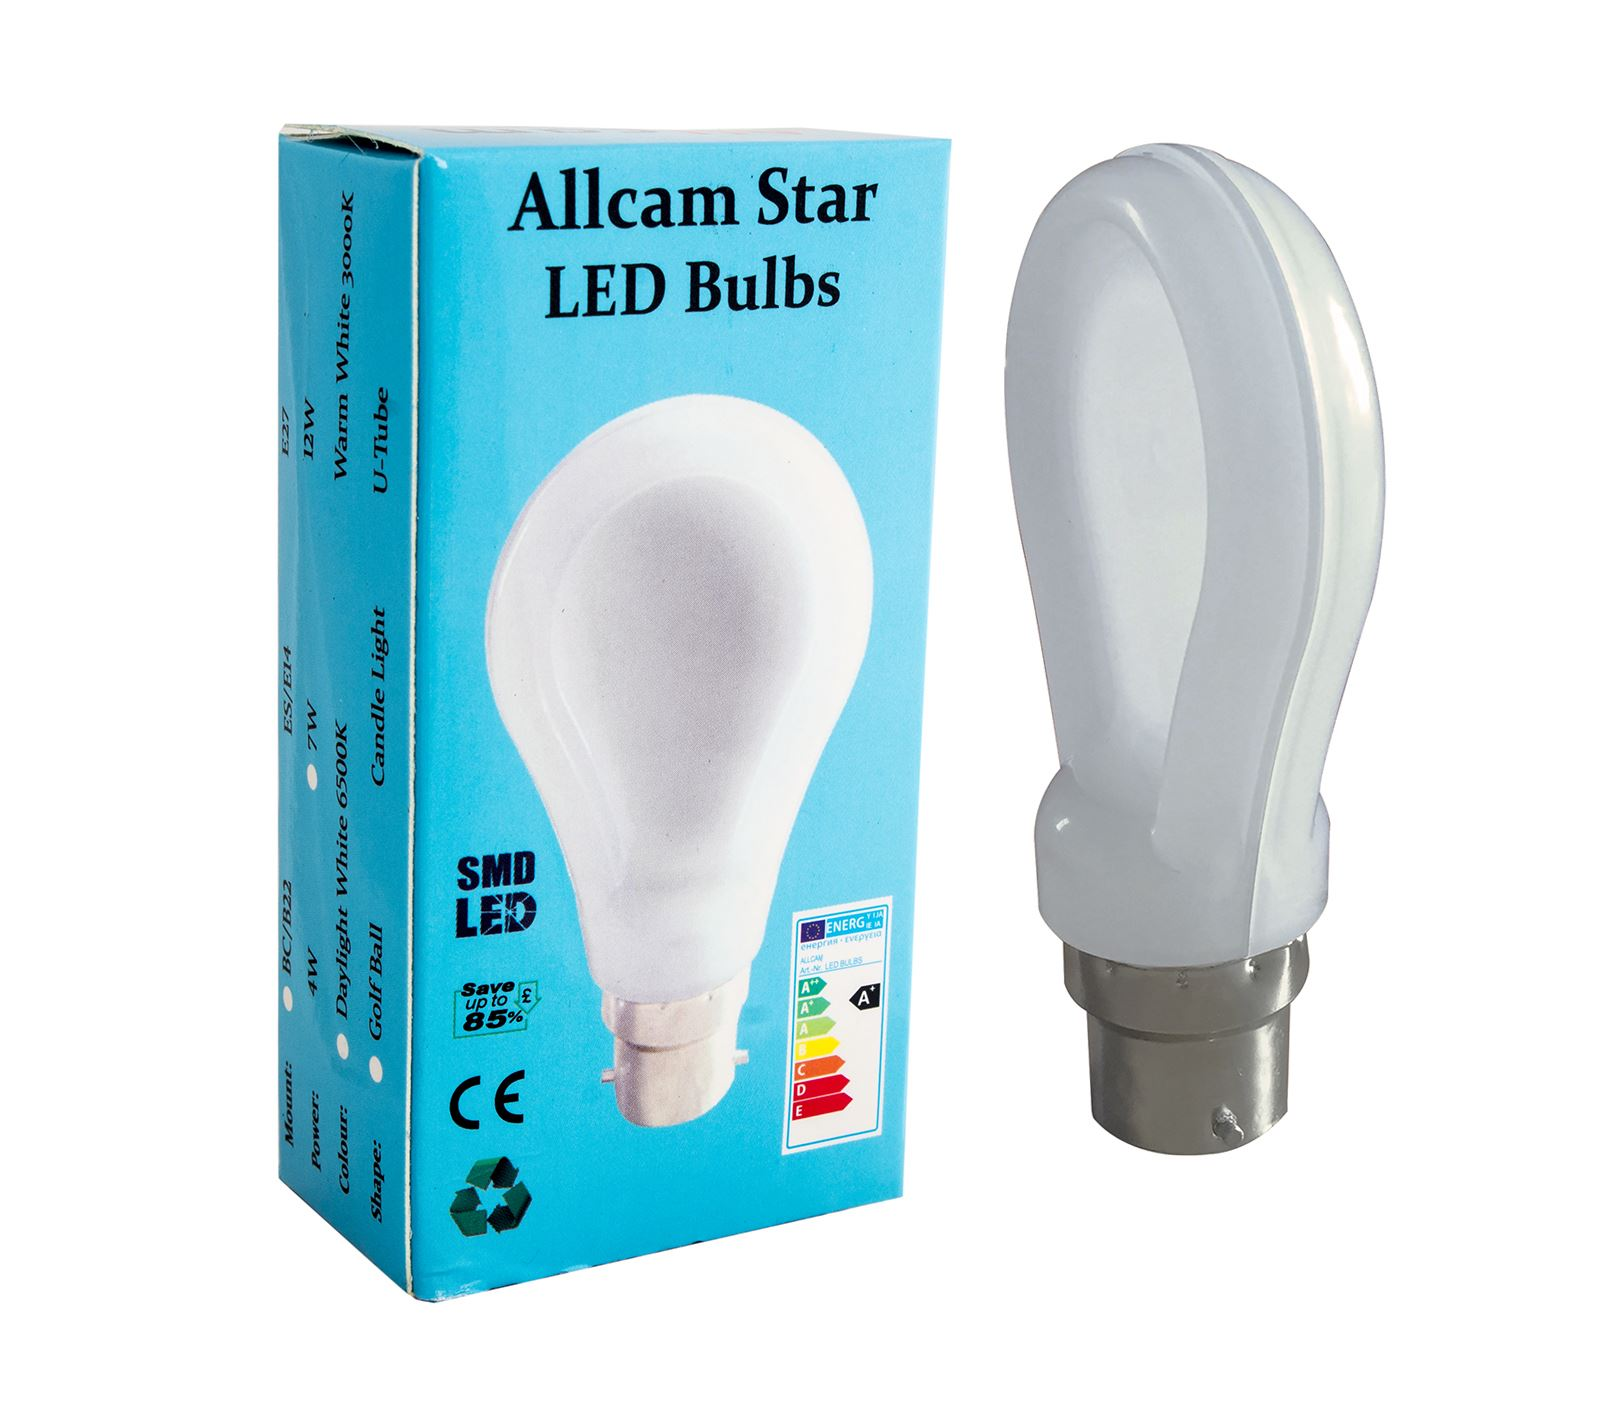 Allcam-Star-7W-B22-Led-Bulbs-600-Lm-70-80W-old-type-Warm-White-Cool-White